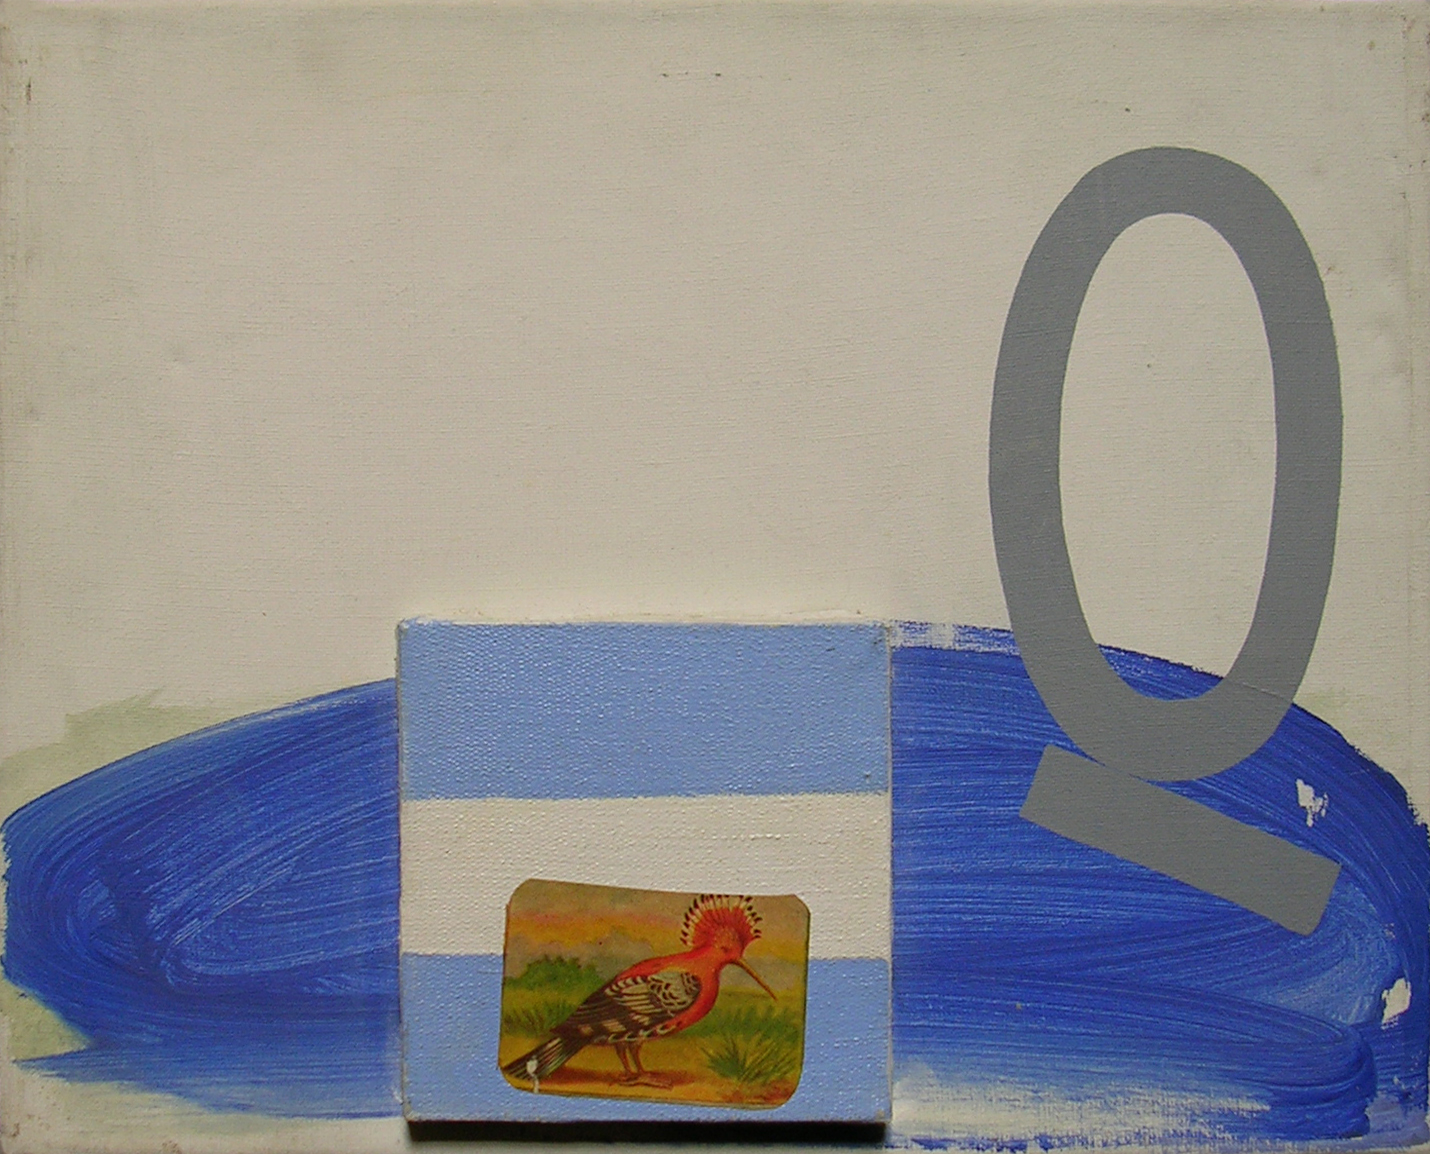 Abecedario Q ; objetos ensamblados, tela, papel sobre bastidor, 30 cm x 40 cm, 2007